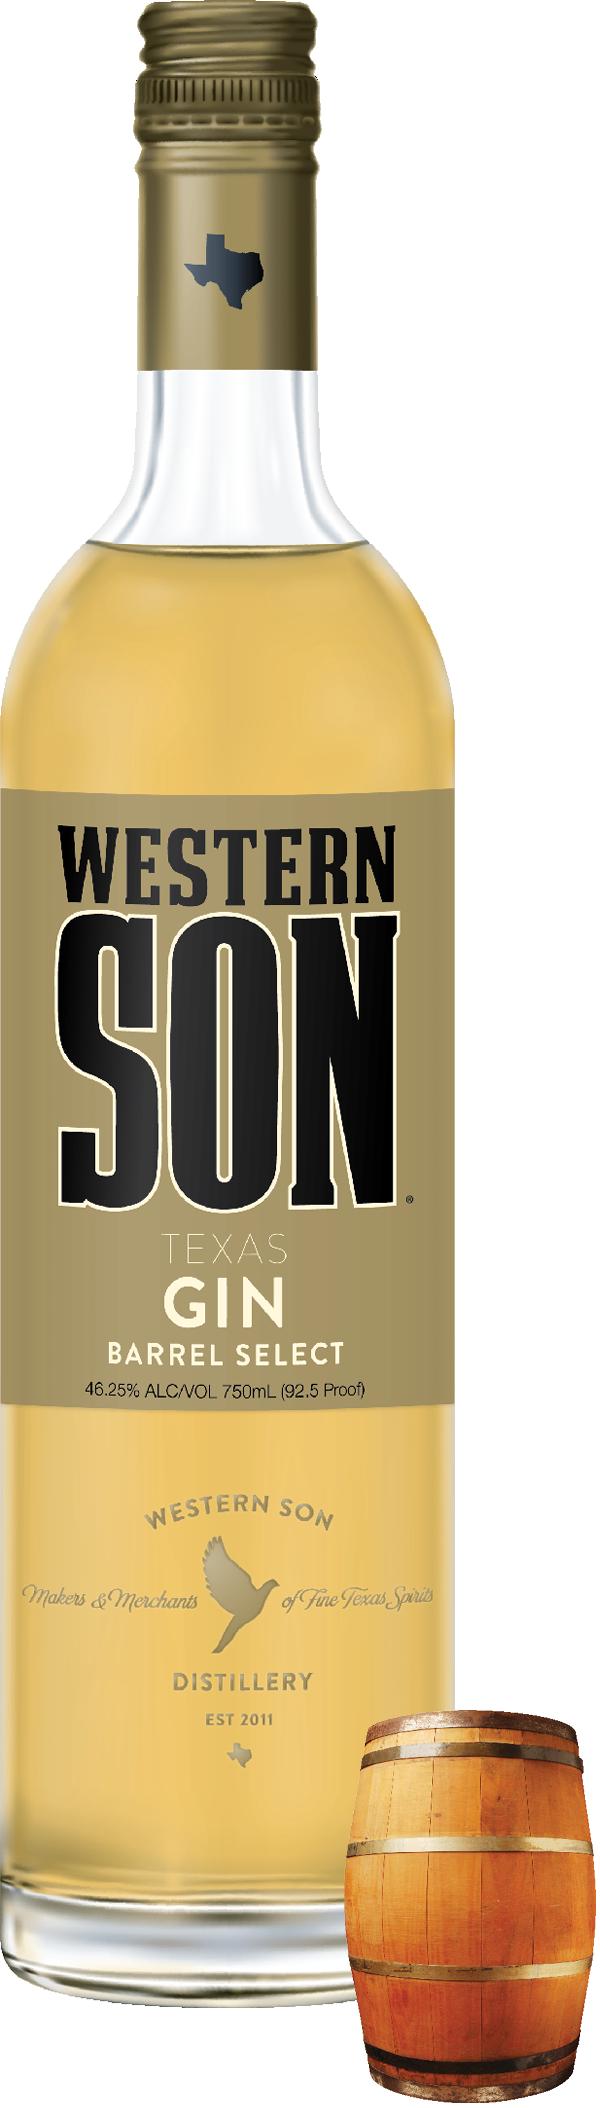 Western Son Barrel Select Gin